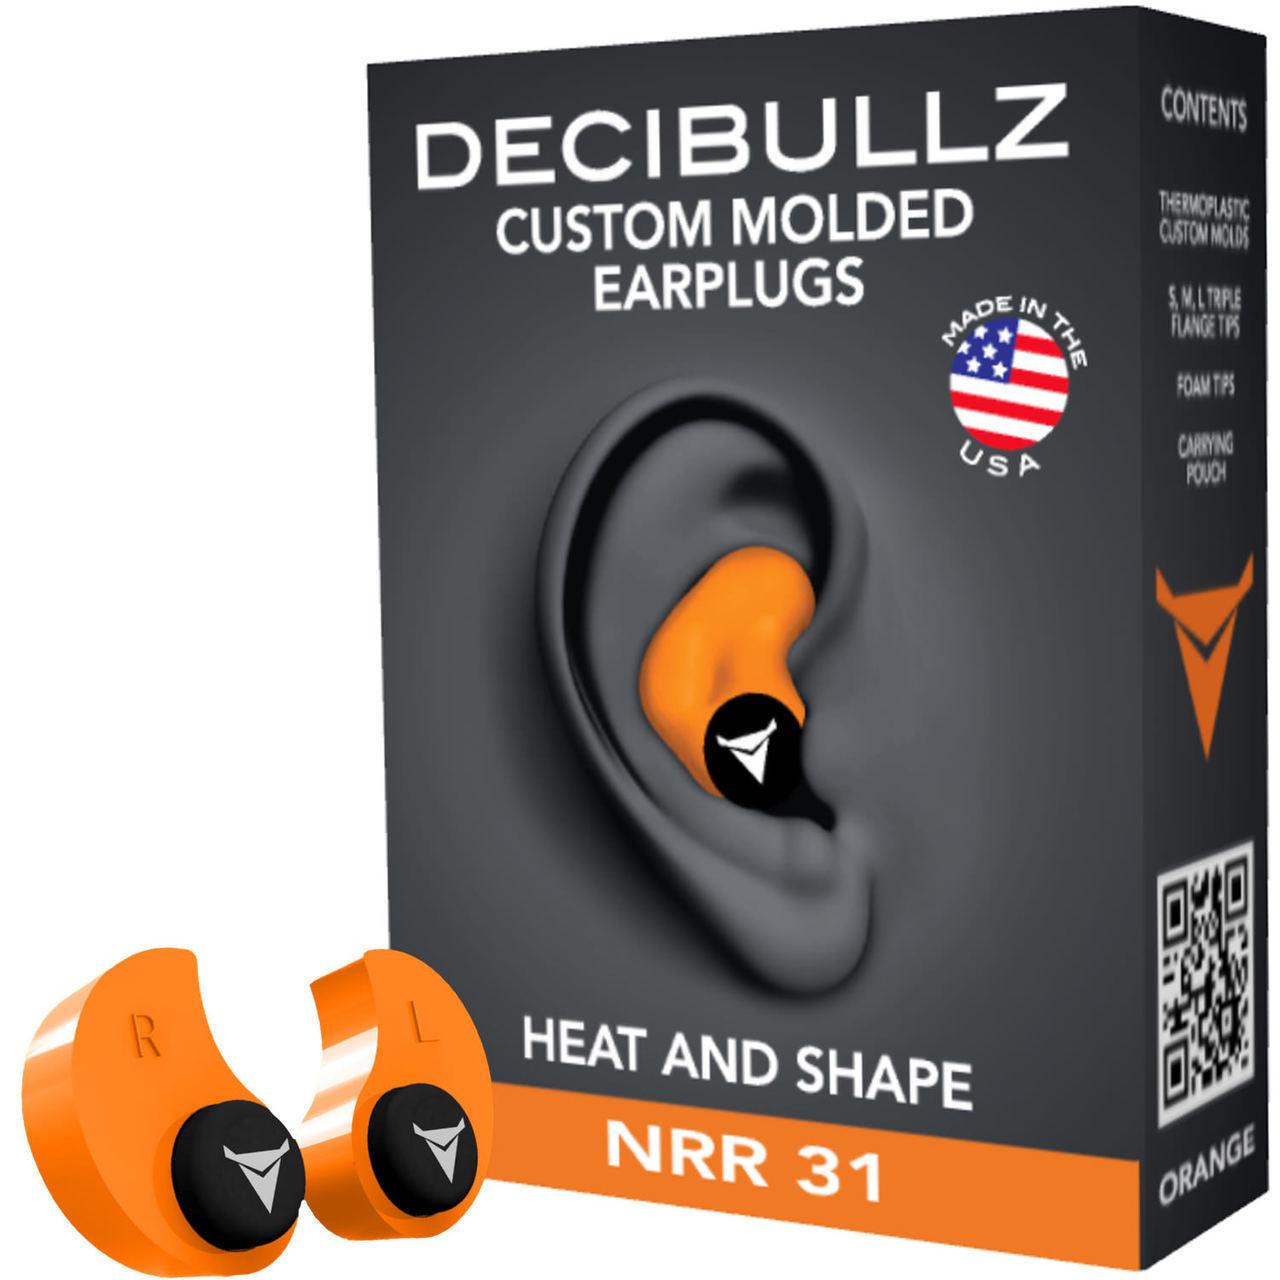 DECIBULLZ Custom Molded Earplug for Surveillance Microphones